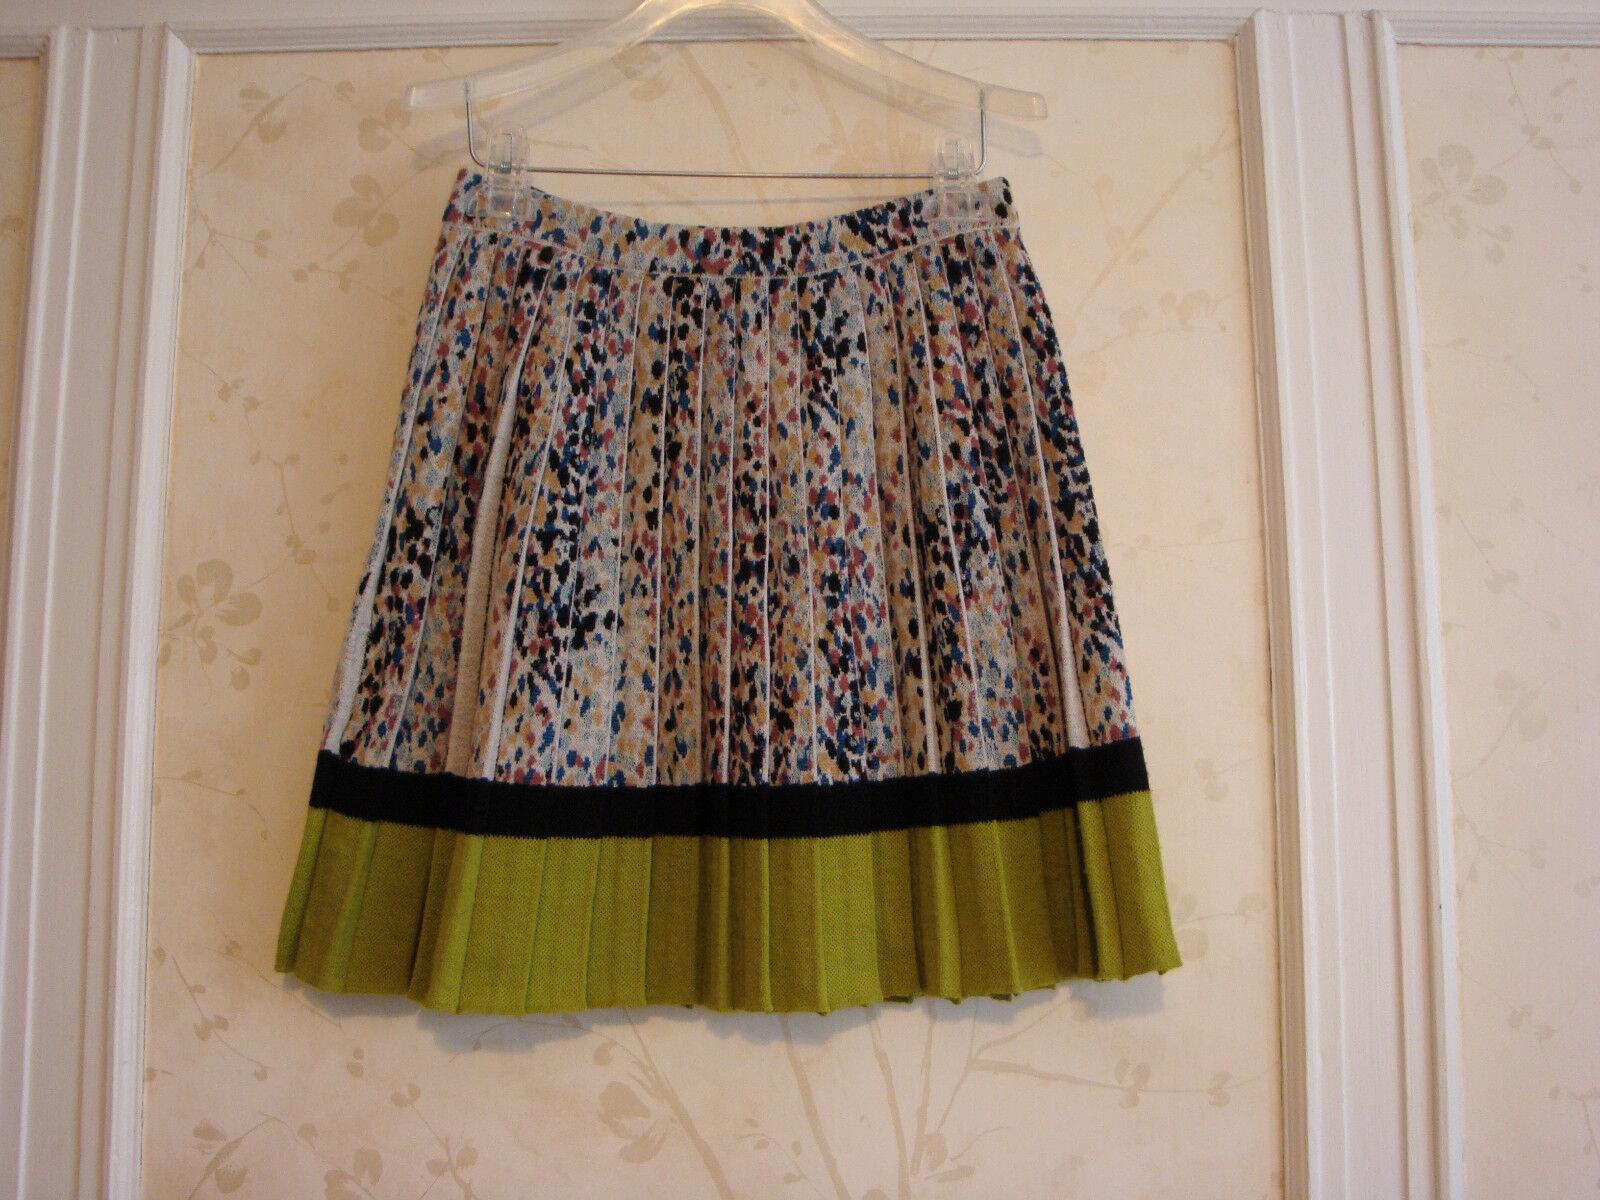 NWT  545 MISSONI  Wool Pleated Skirt 42  8  Made In   Cream  Multi